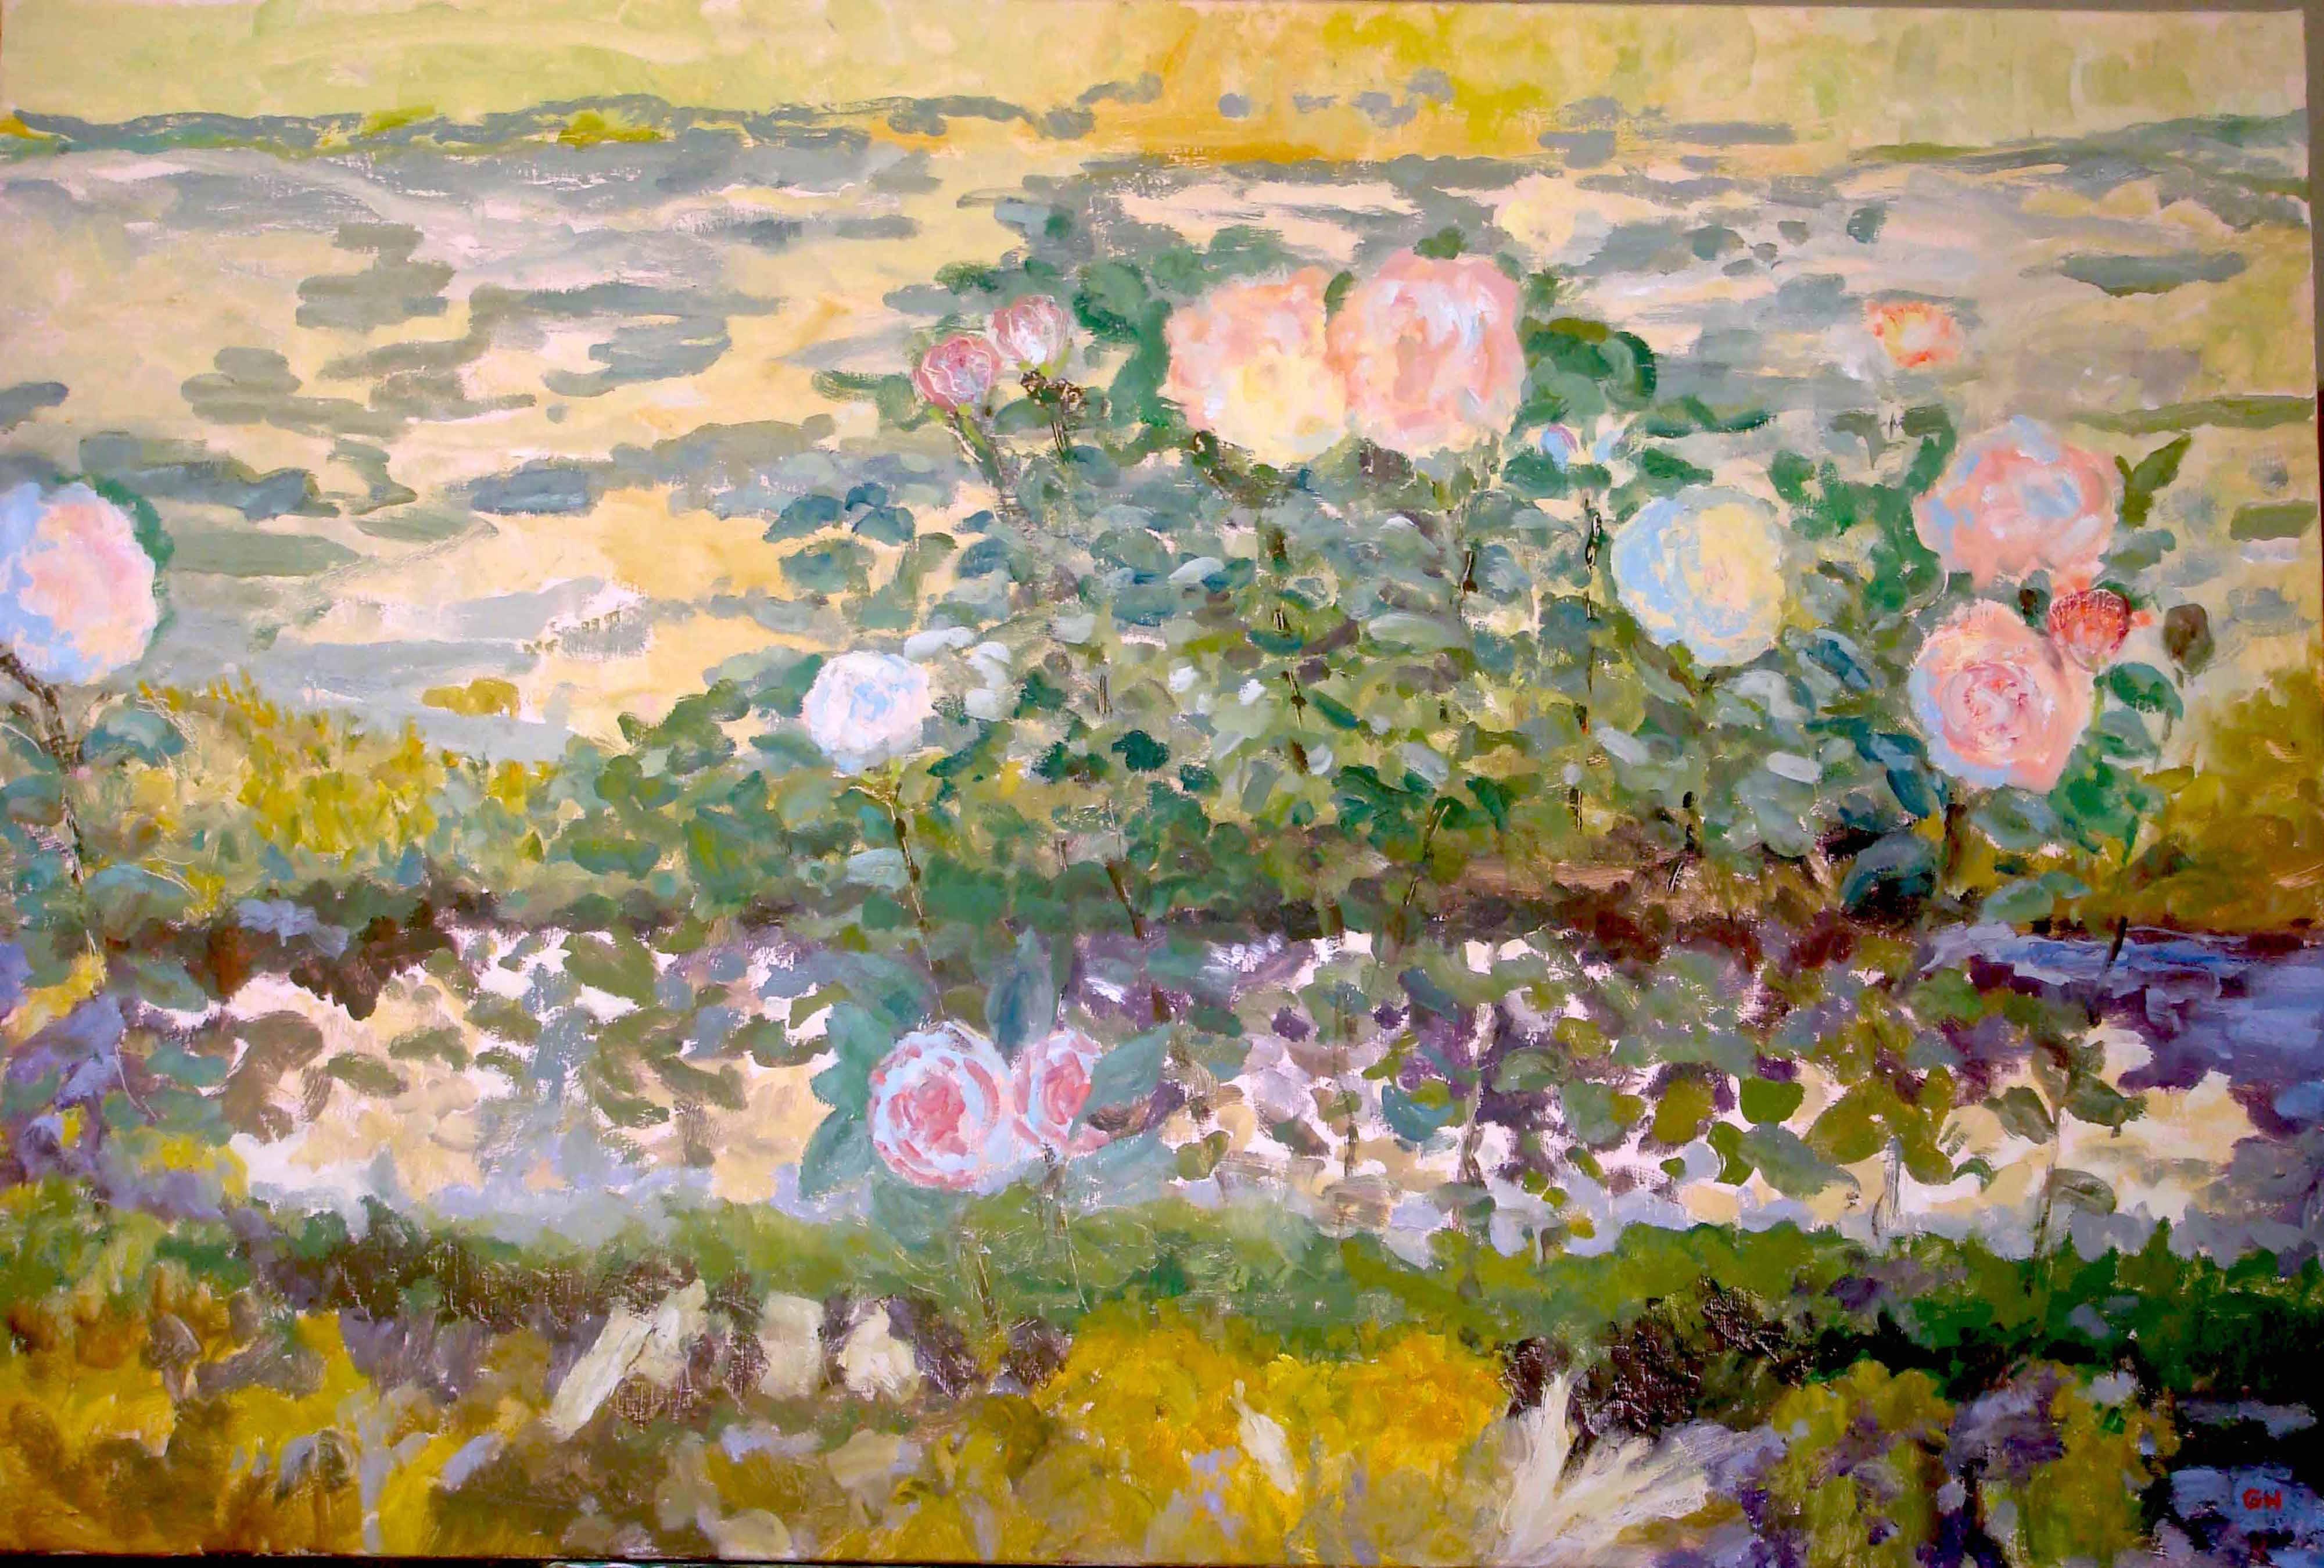 Image of - Blue Roses Reflecting